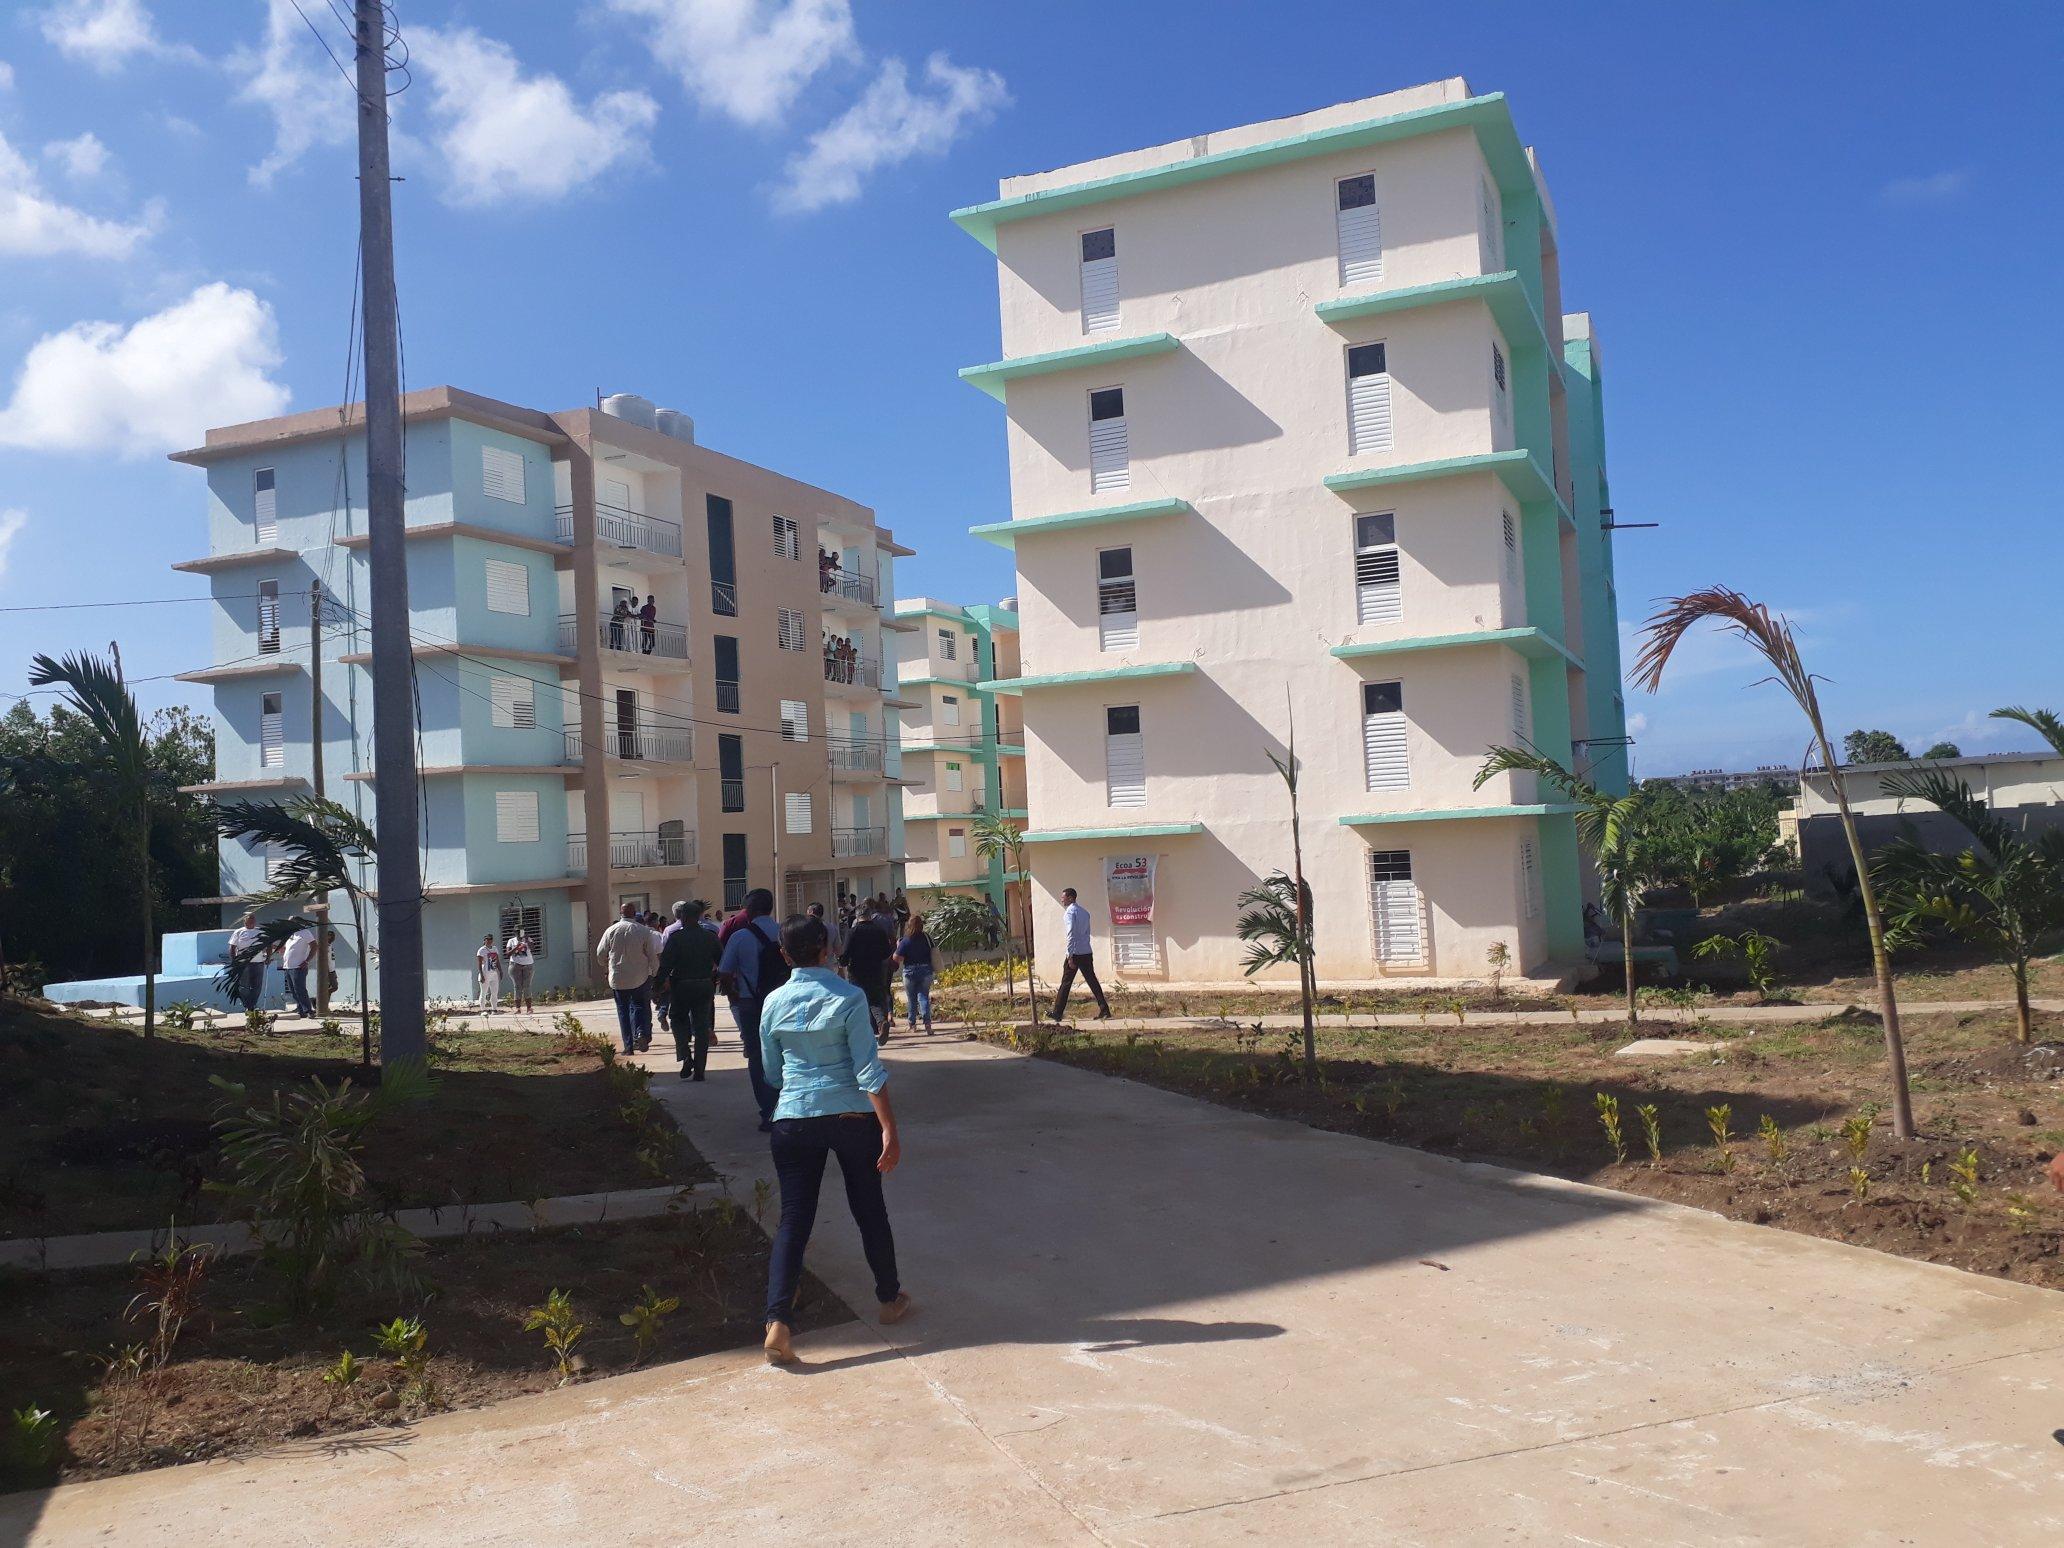 1107-diaz-canel-entrega-viviendas2.jpg